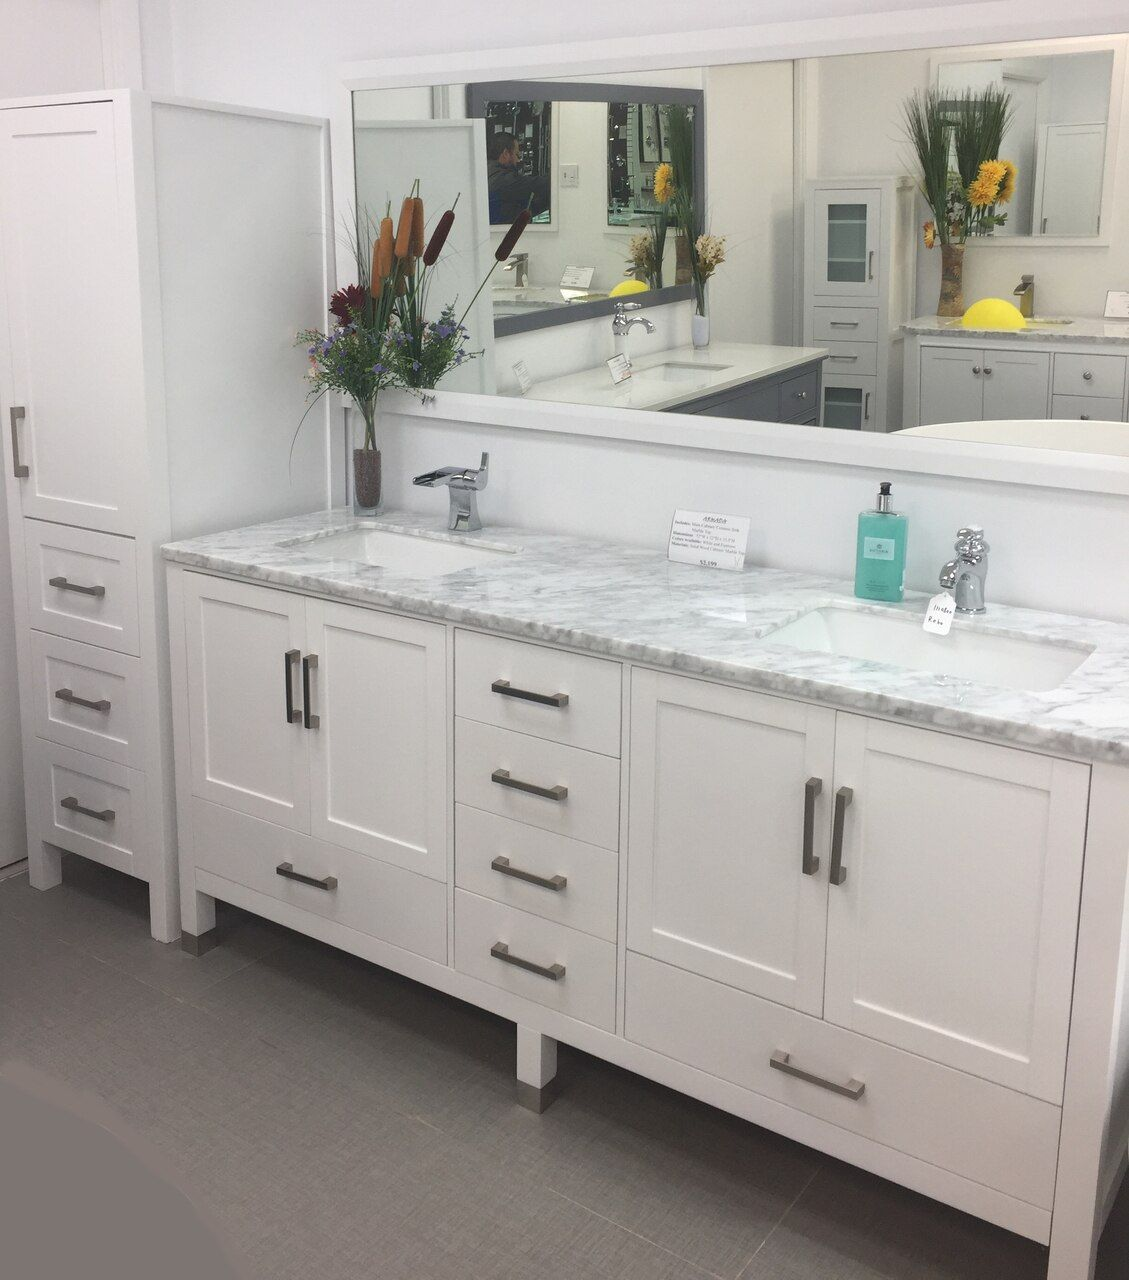 Palmera 90 Inch Double Sink Bathroom White Vanity Side Cabinet Tower Double Sink Bathroom White Vanity Bathroom Double Sink Bathroom Vanity [ 1280 x 1129 Pixel ]